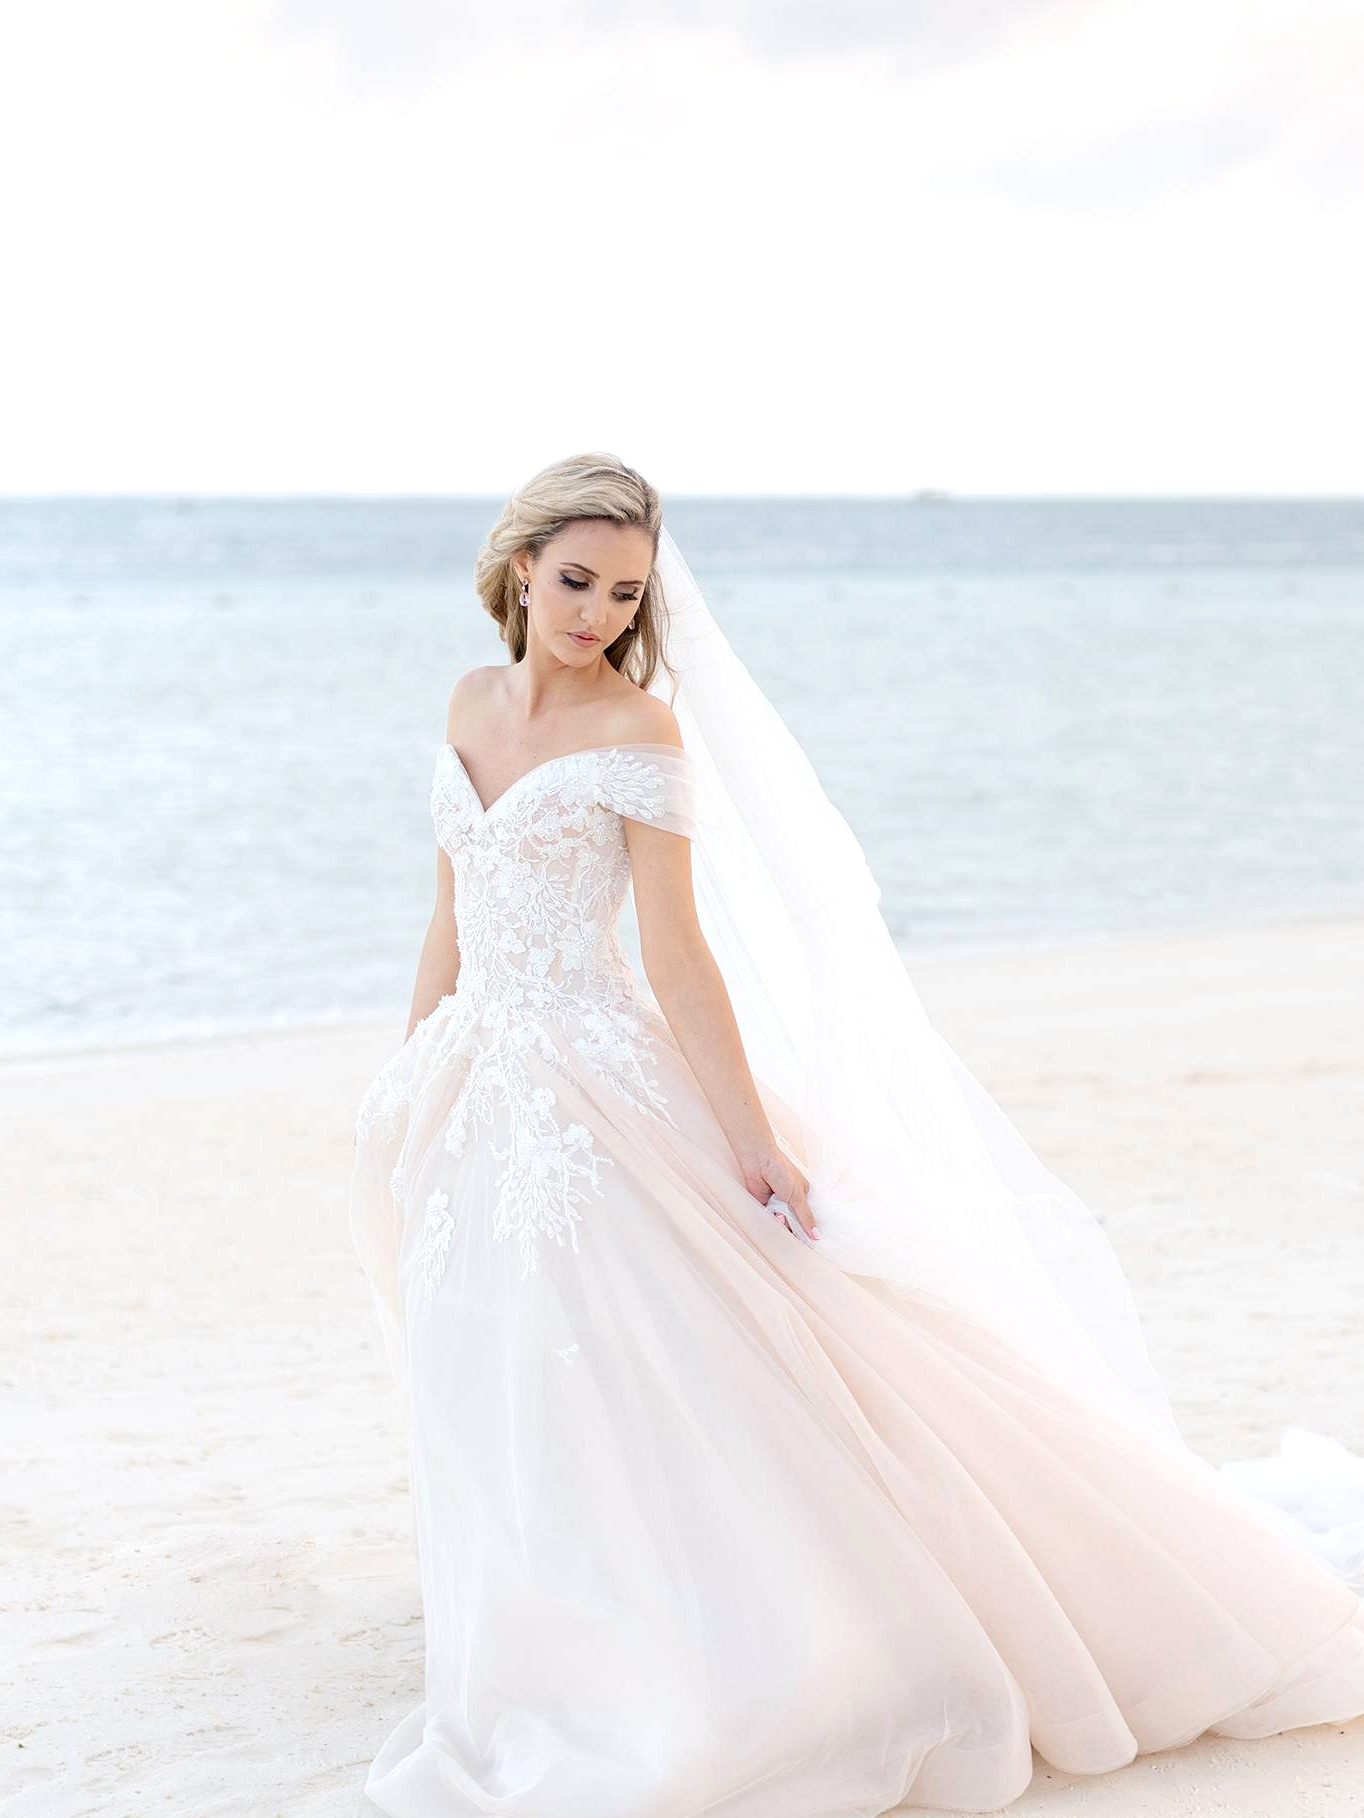 Chic Beach Wedding South Africa 002